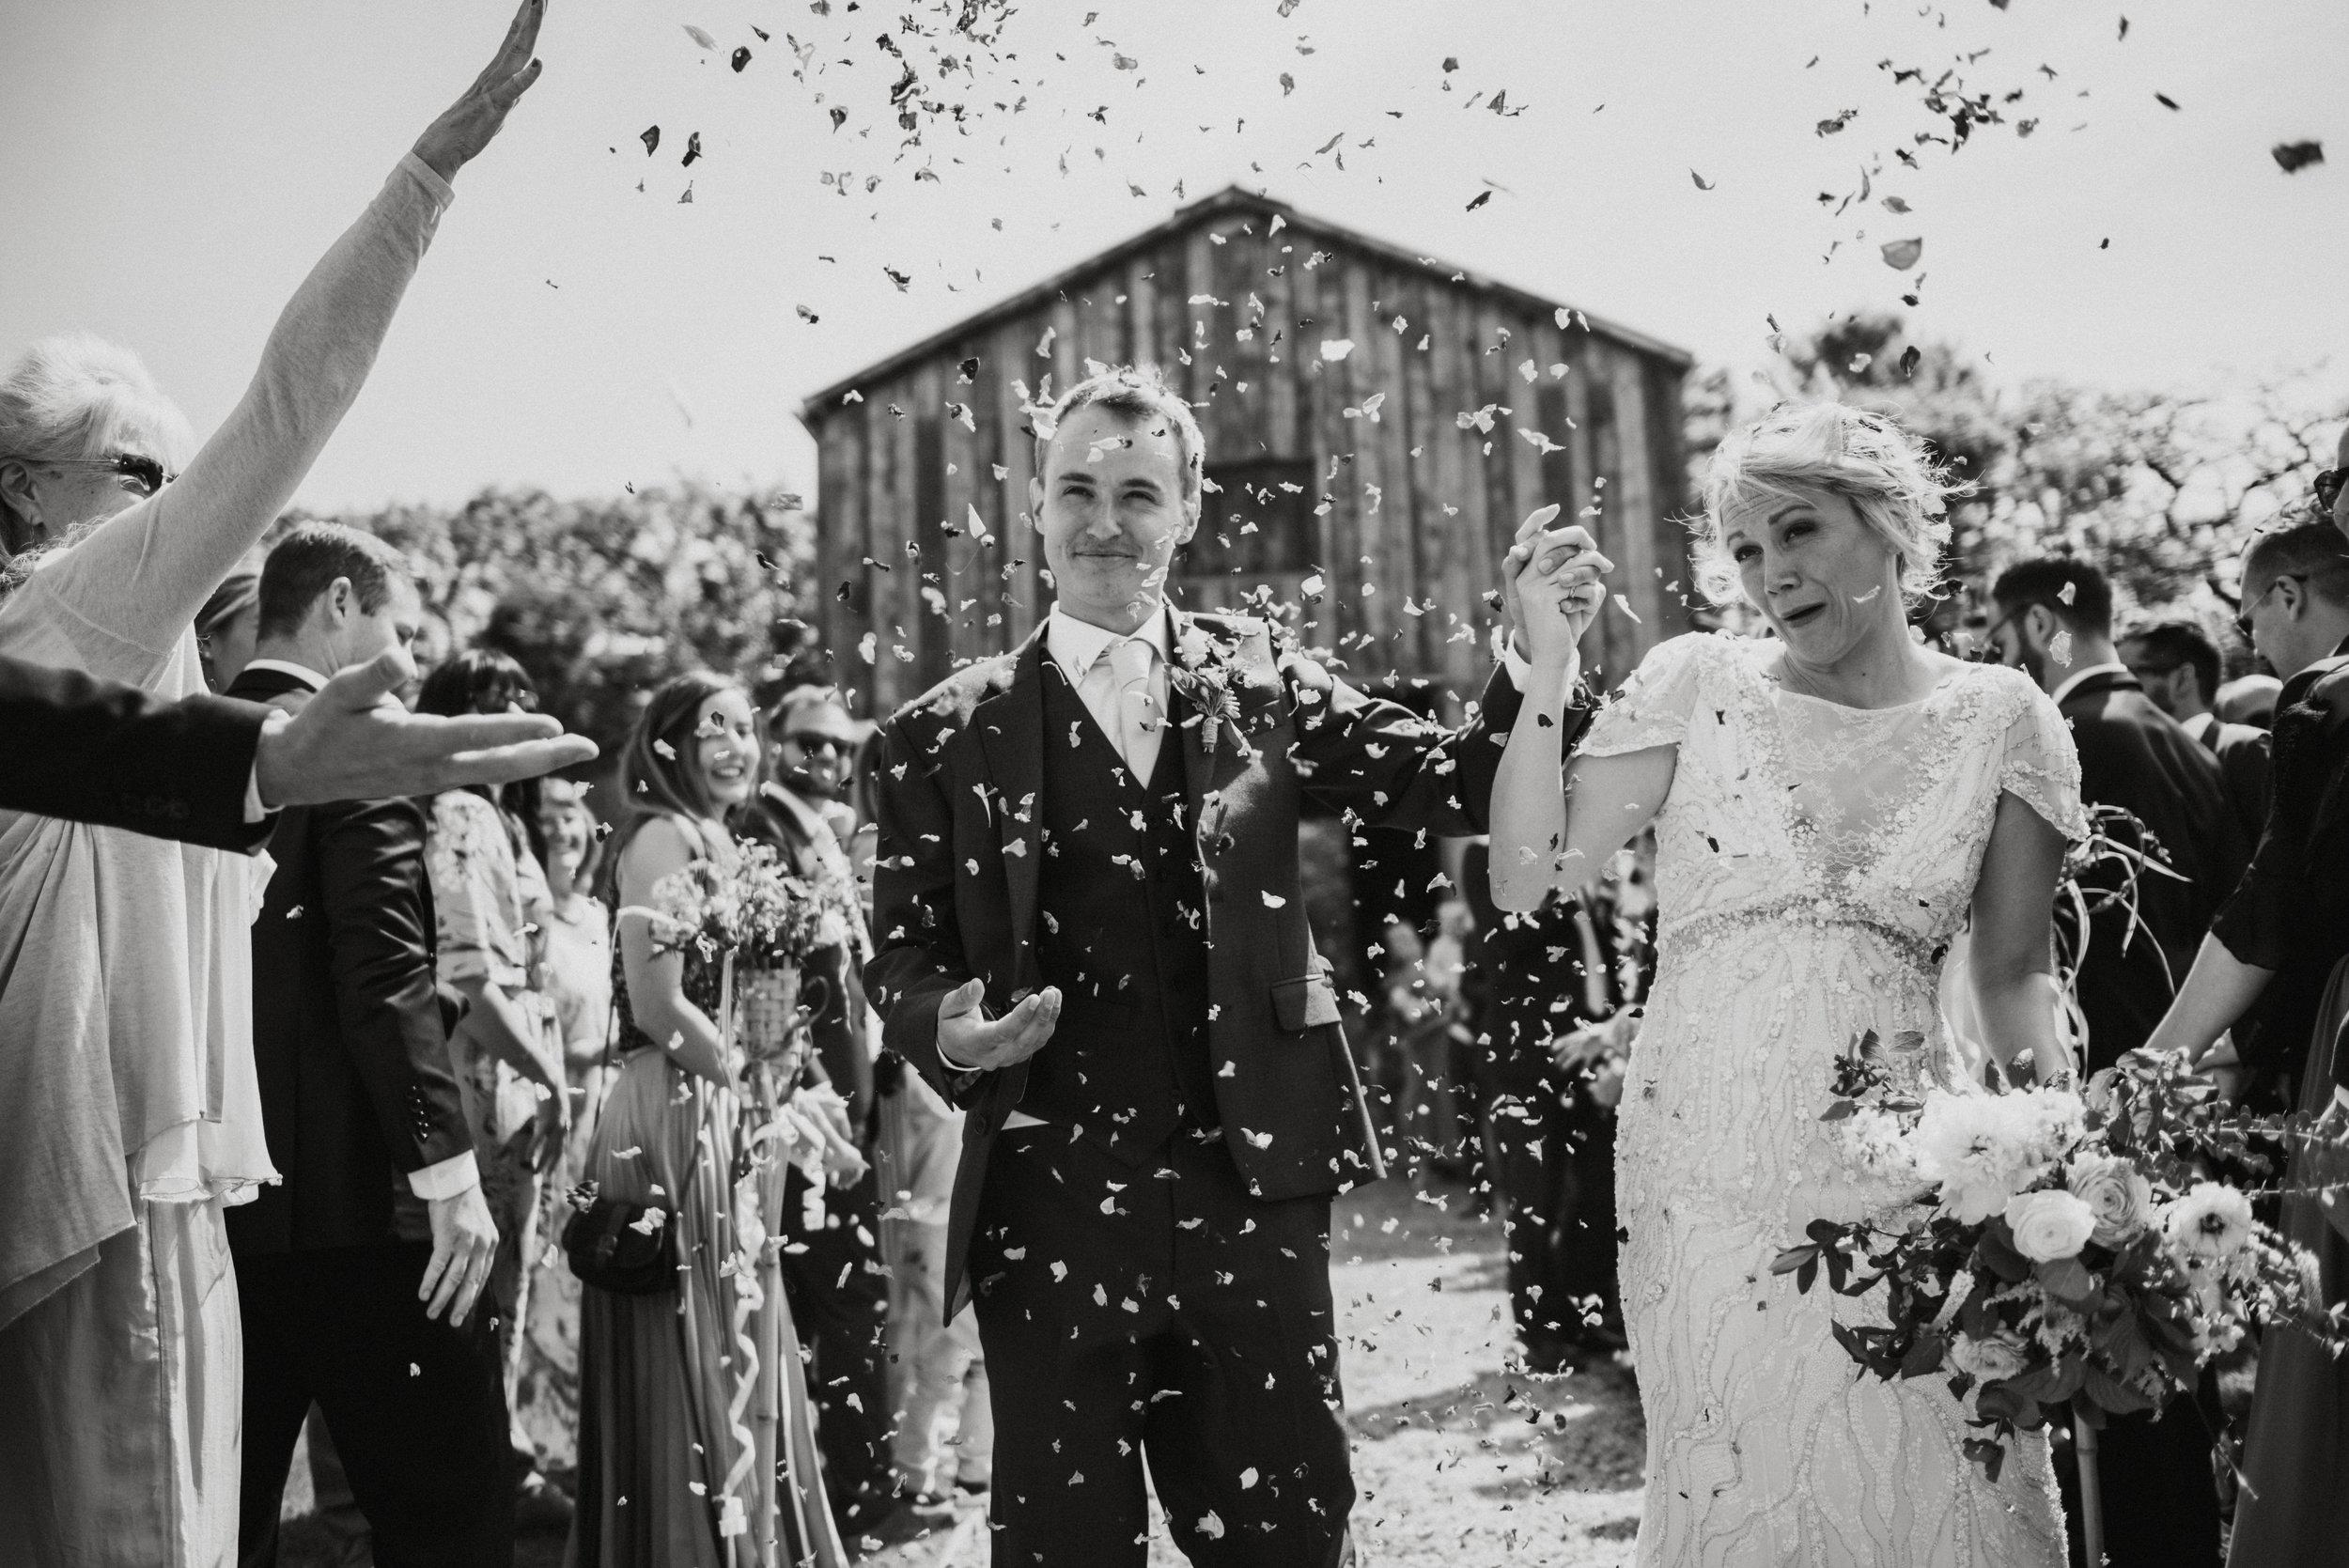 nancarrow-wedding-photographer-cornwall.jpg